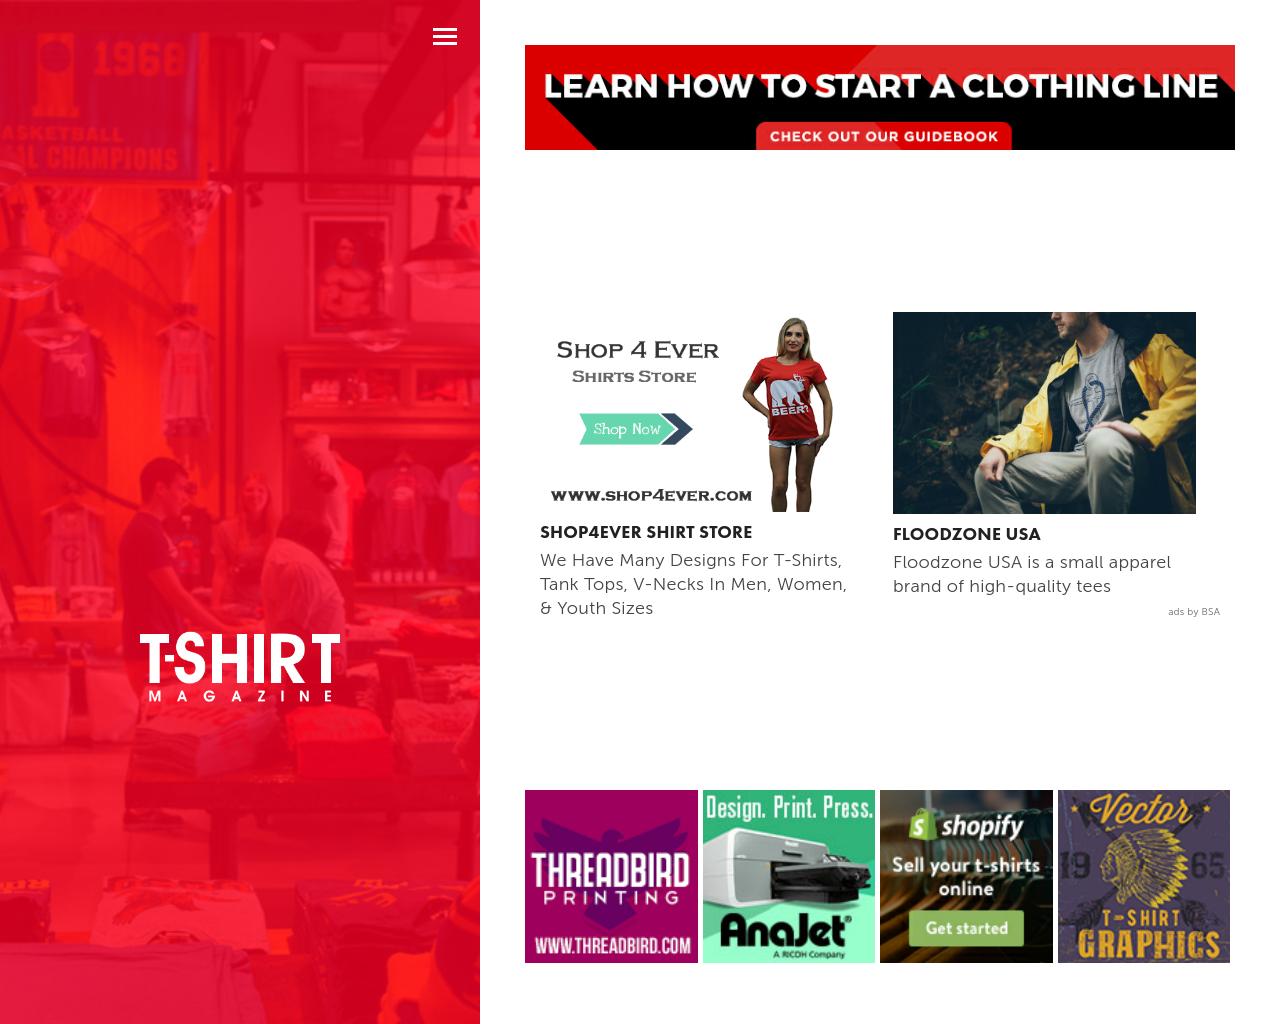 T-SHIRT-MAGAZINE-Advertising-Reviews-Pricing